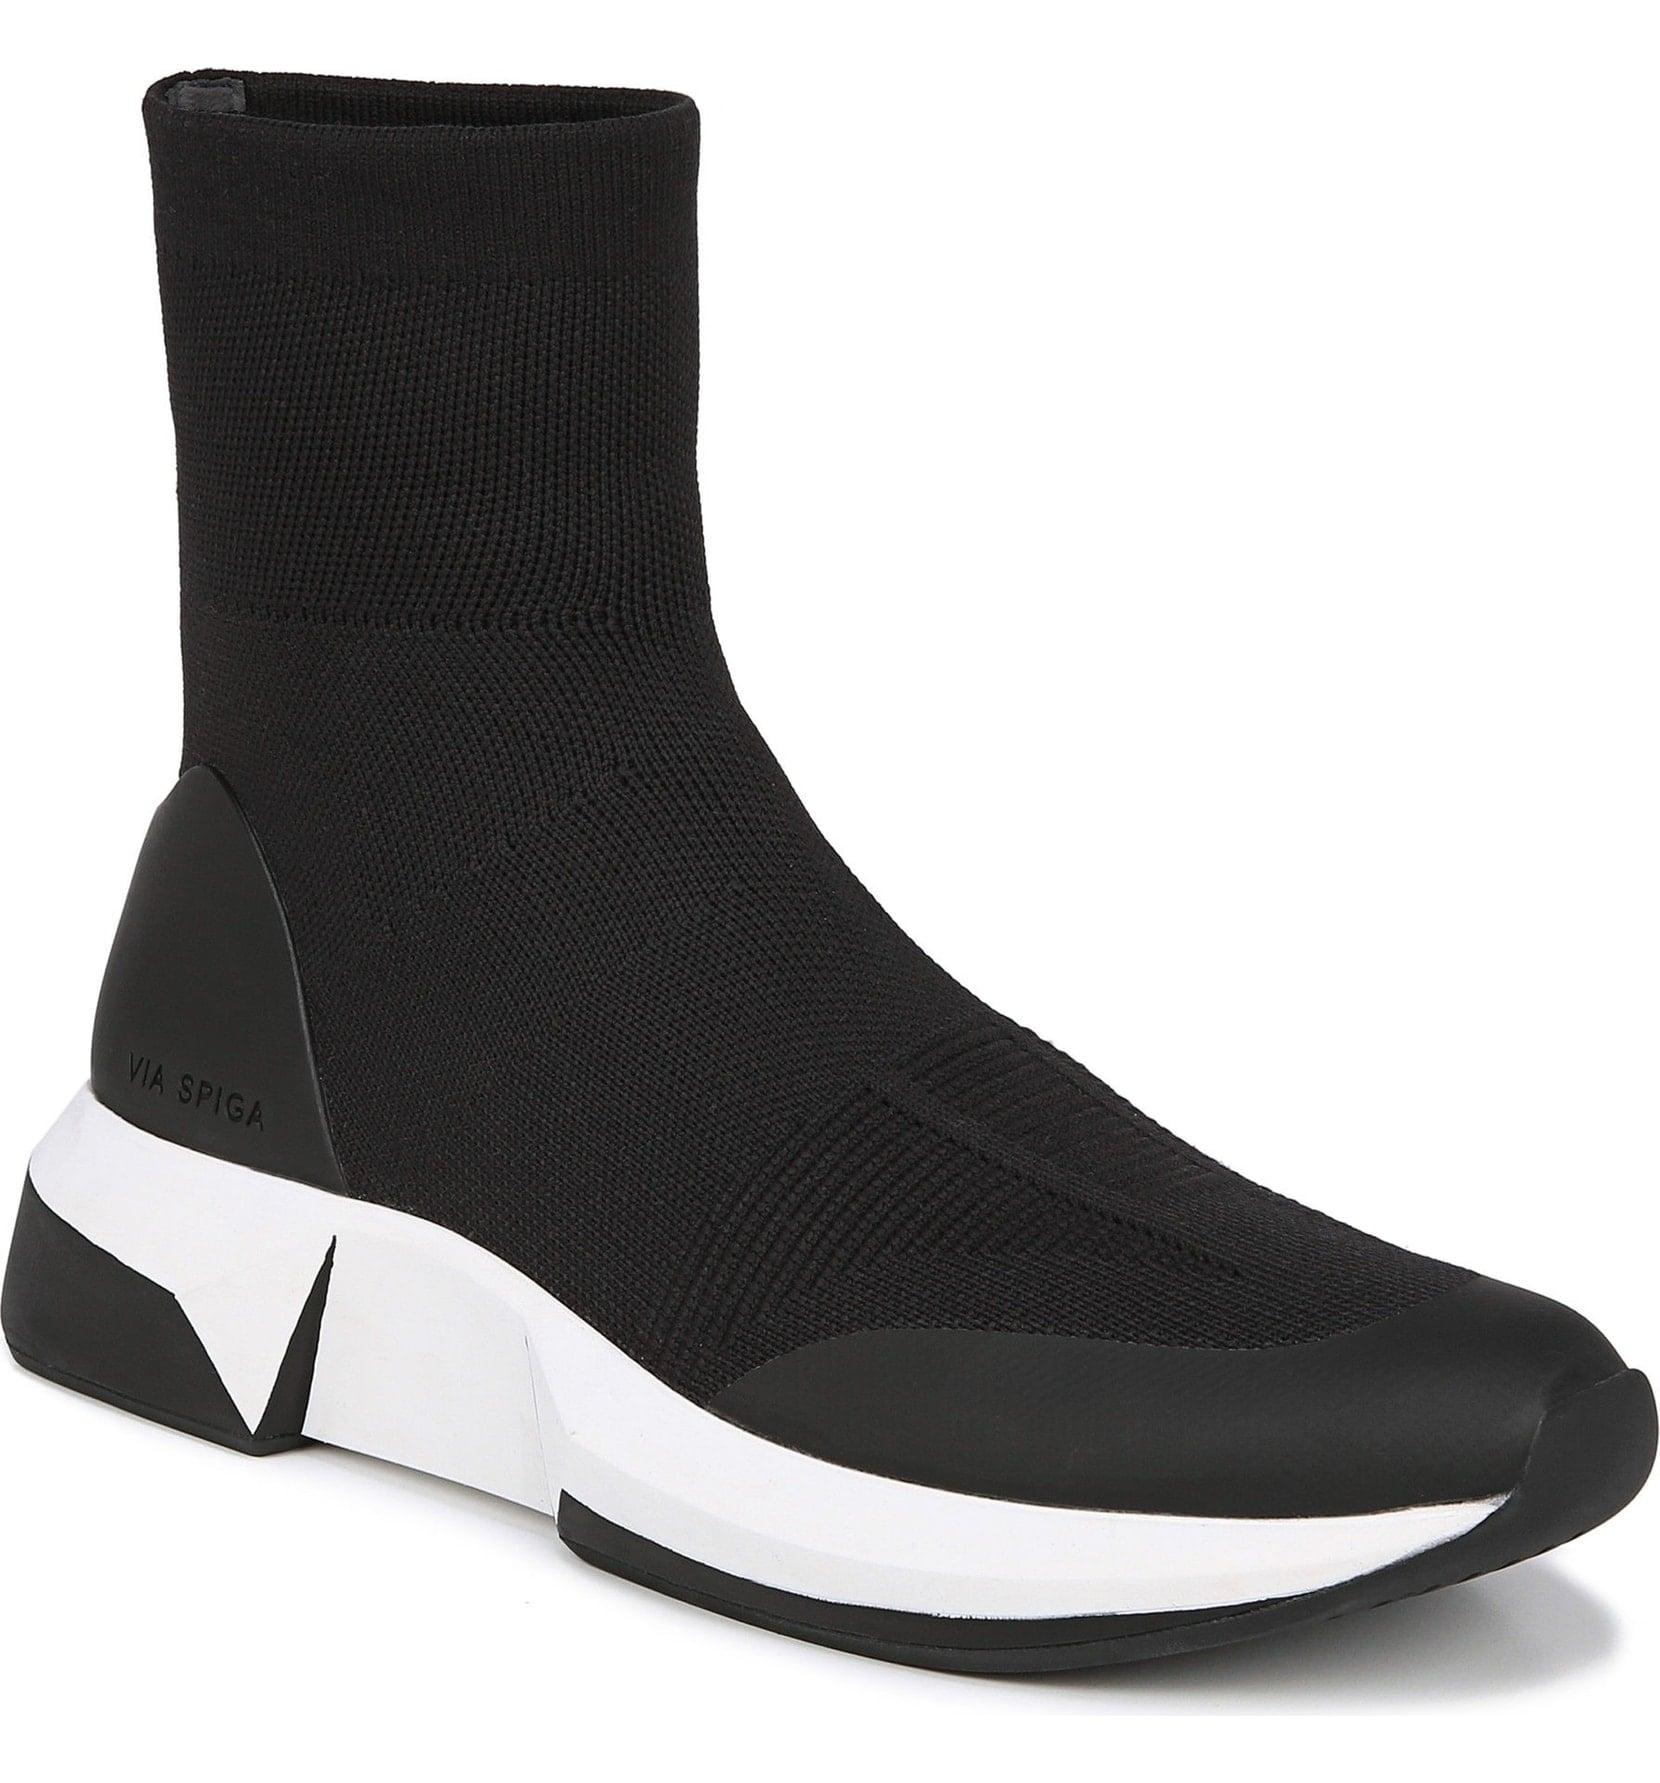 Via Spiga Verion High Top Sock Sneakers